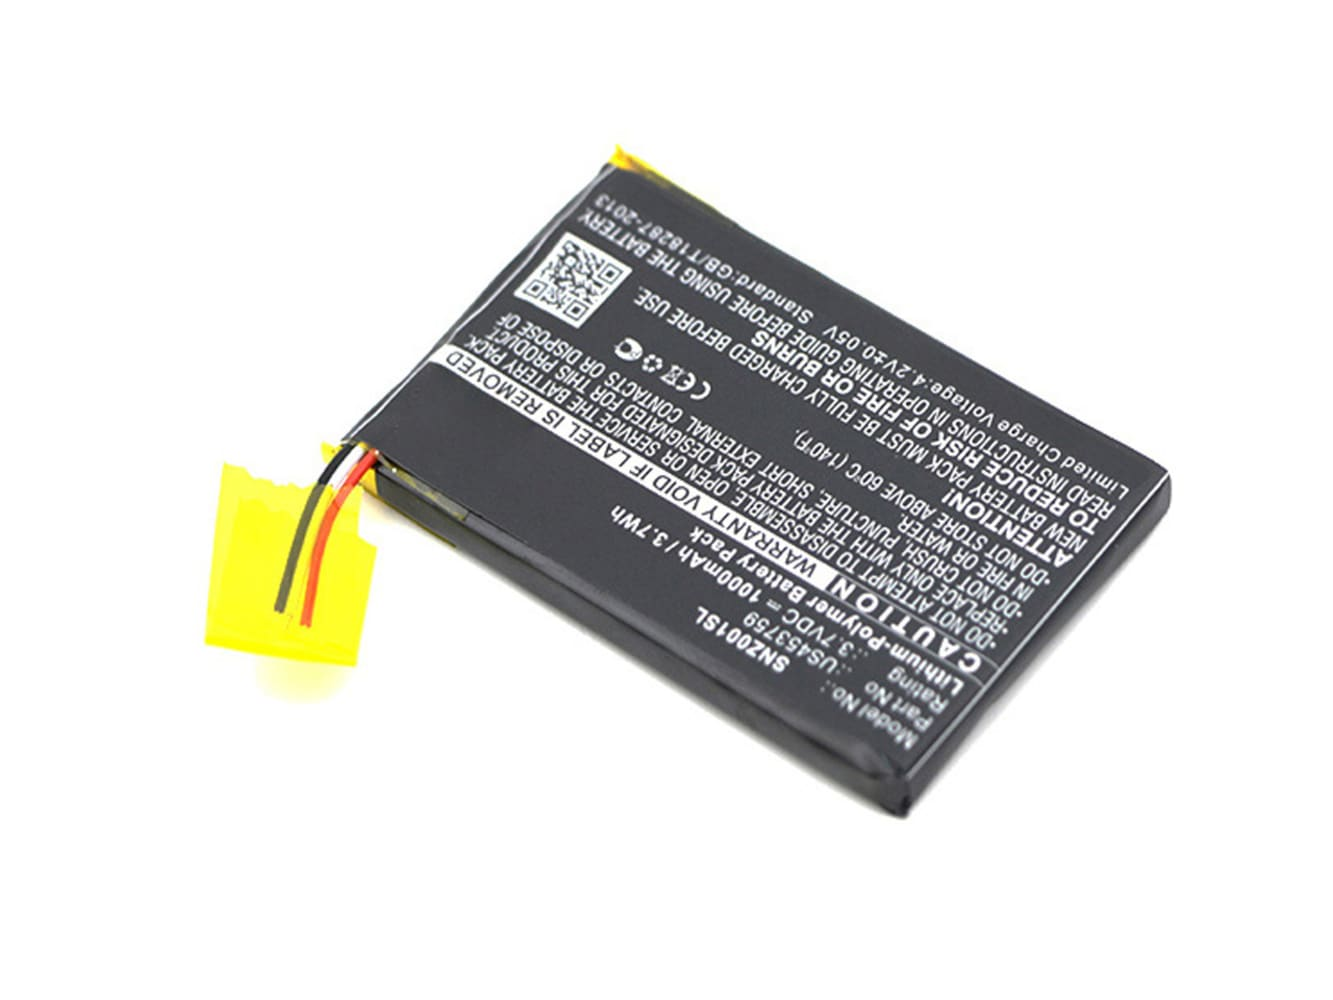 Batterie pour Sony NWZ-ZX1 - US453759 1000mAh